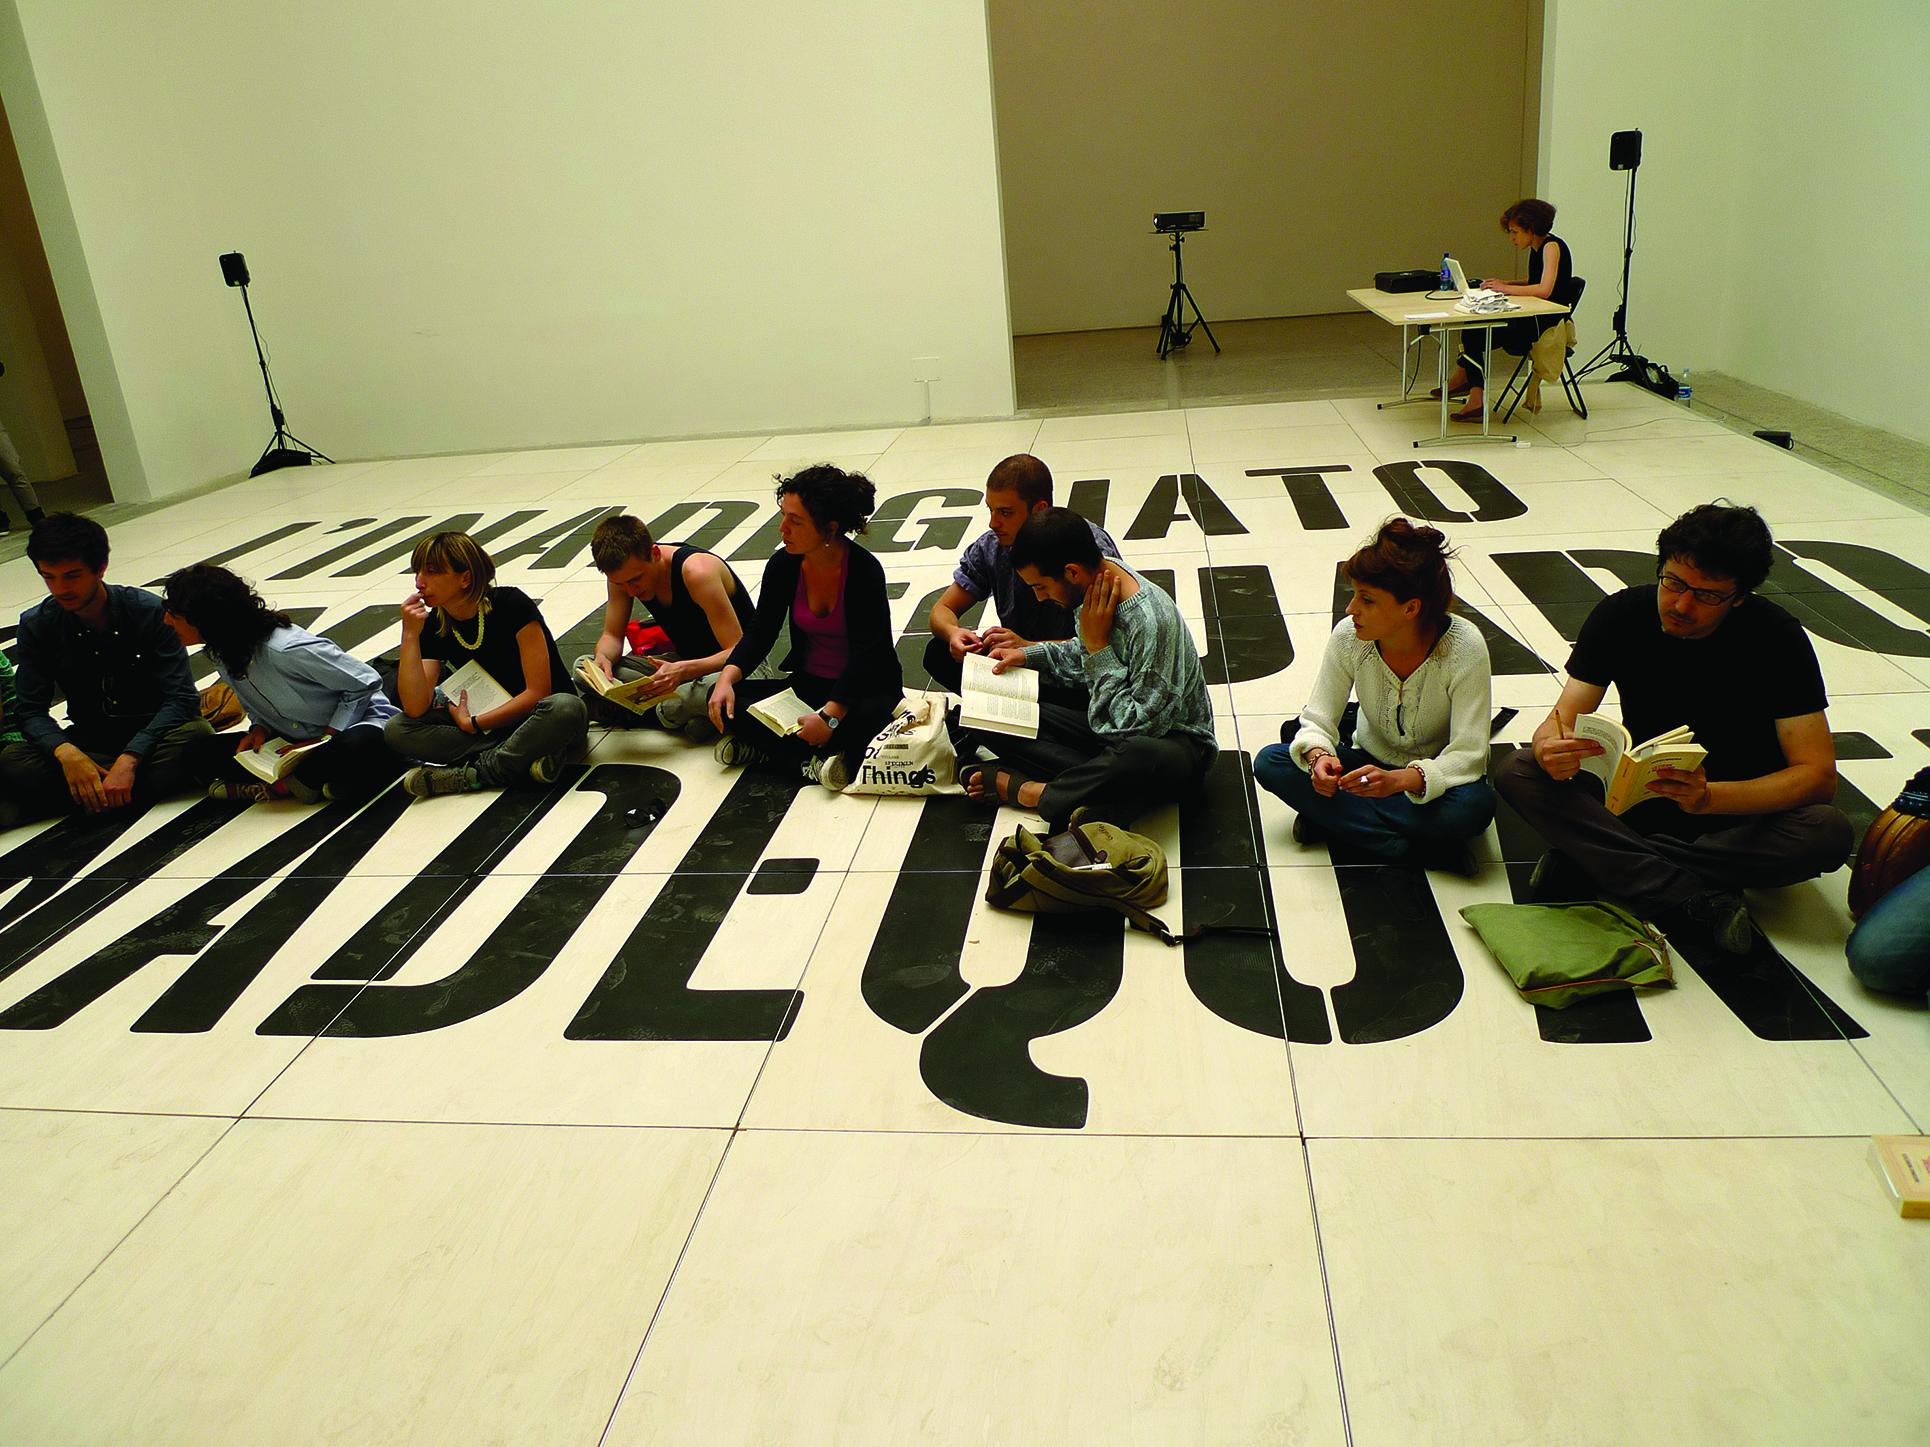 Dora Garcia, Spanish Pavillon on the Venice Biennial 2011 (Photo: Barbara Fässler)